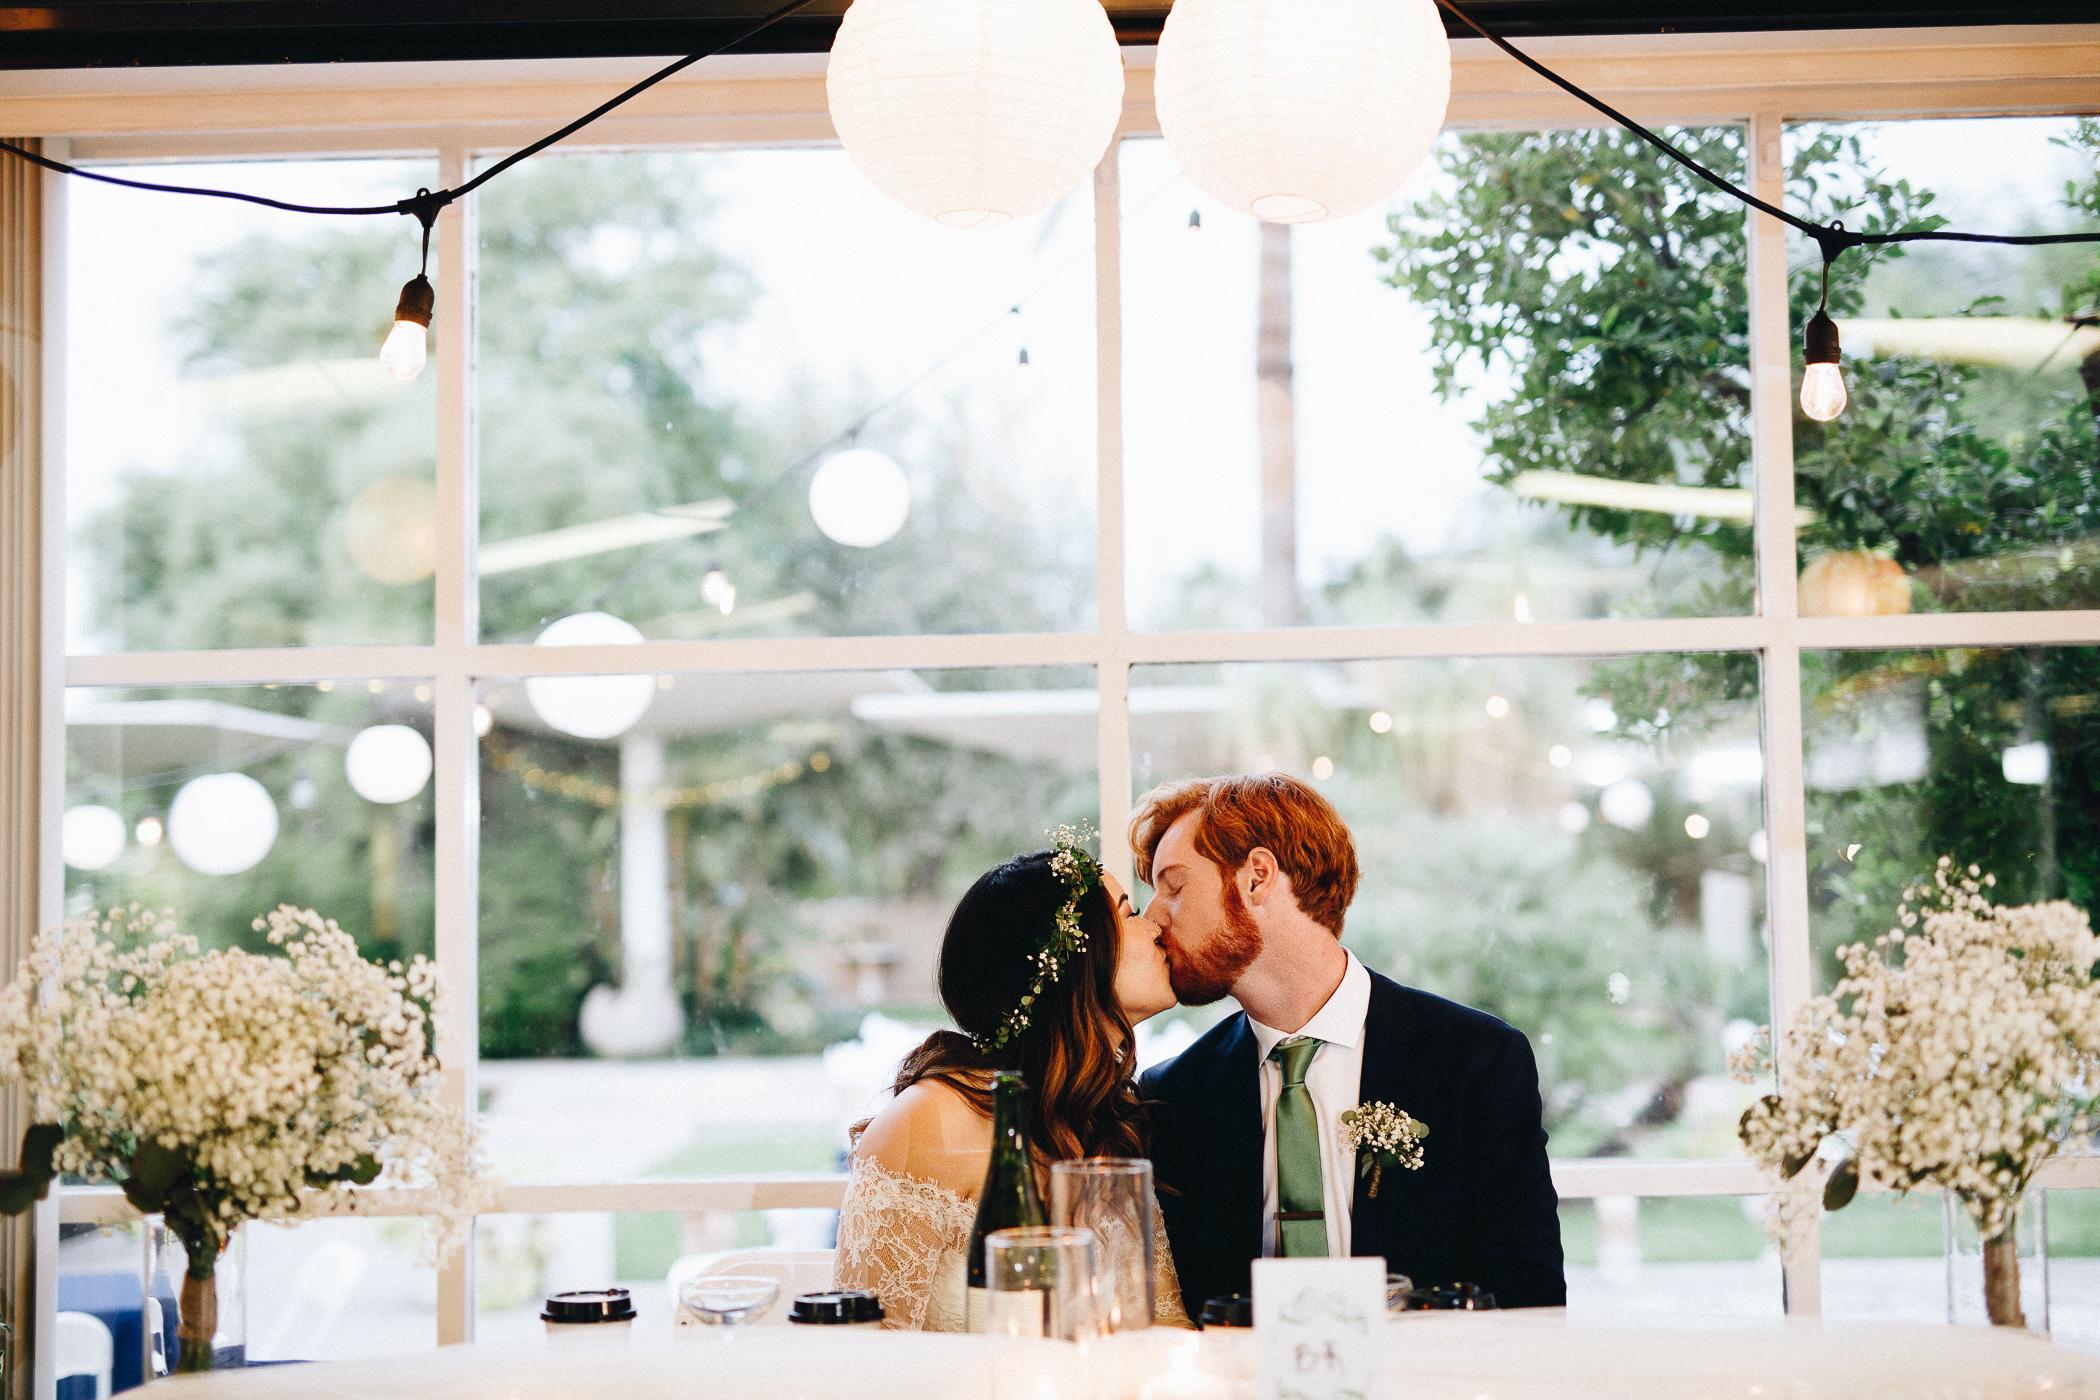 181104-Luxium-Weddings-Arizona-@matt__Le-Brandon-Kariana-Phoenix-Valley-Garden-Center-1121.jpg